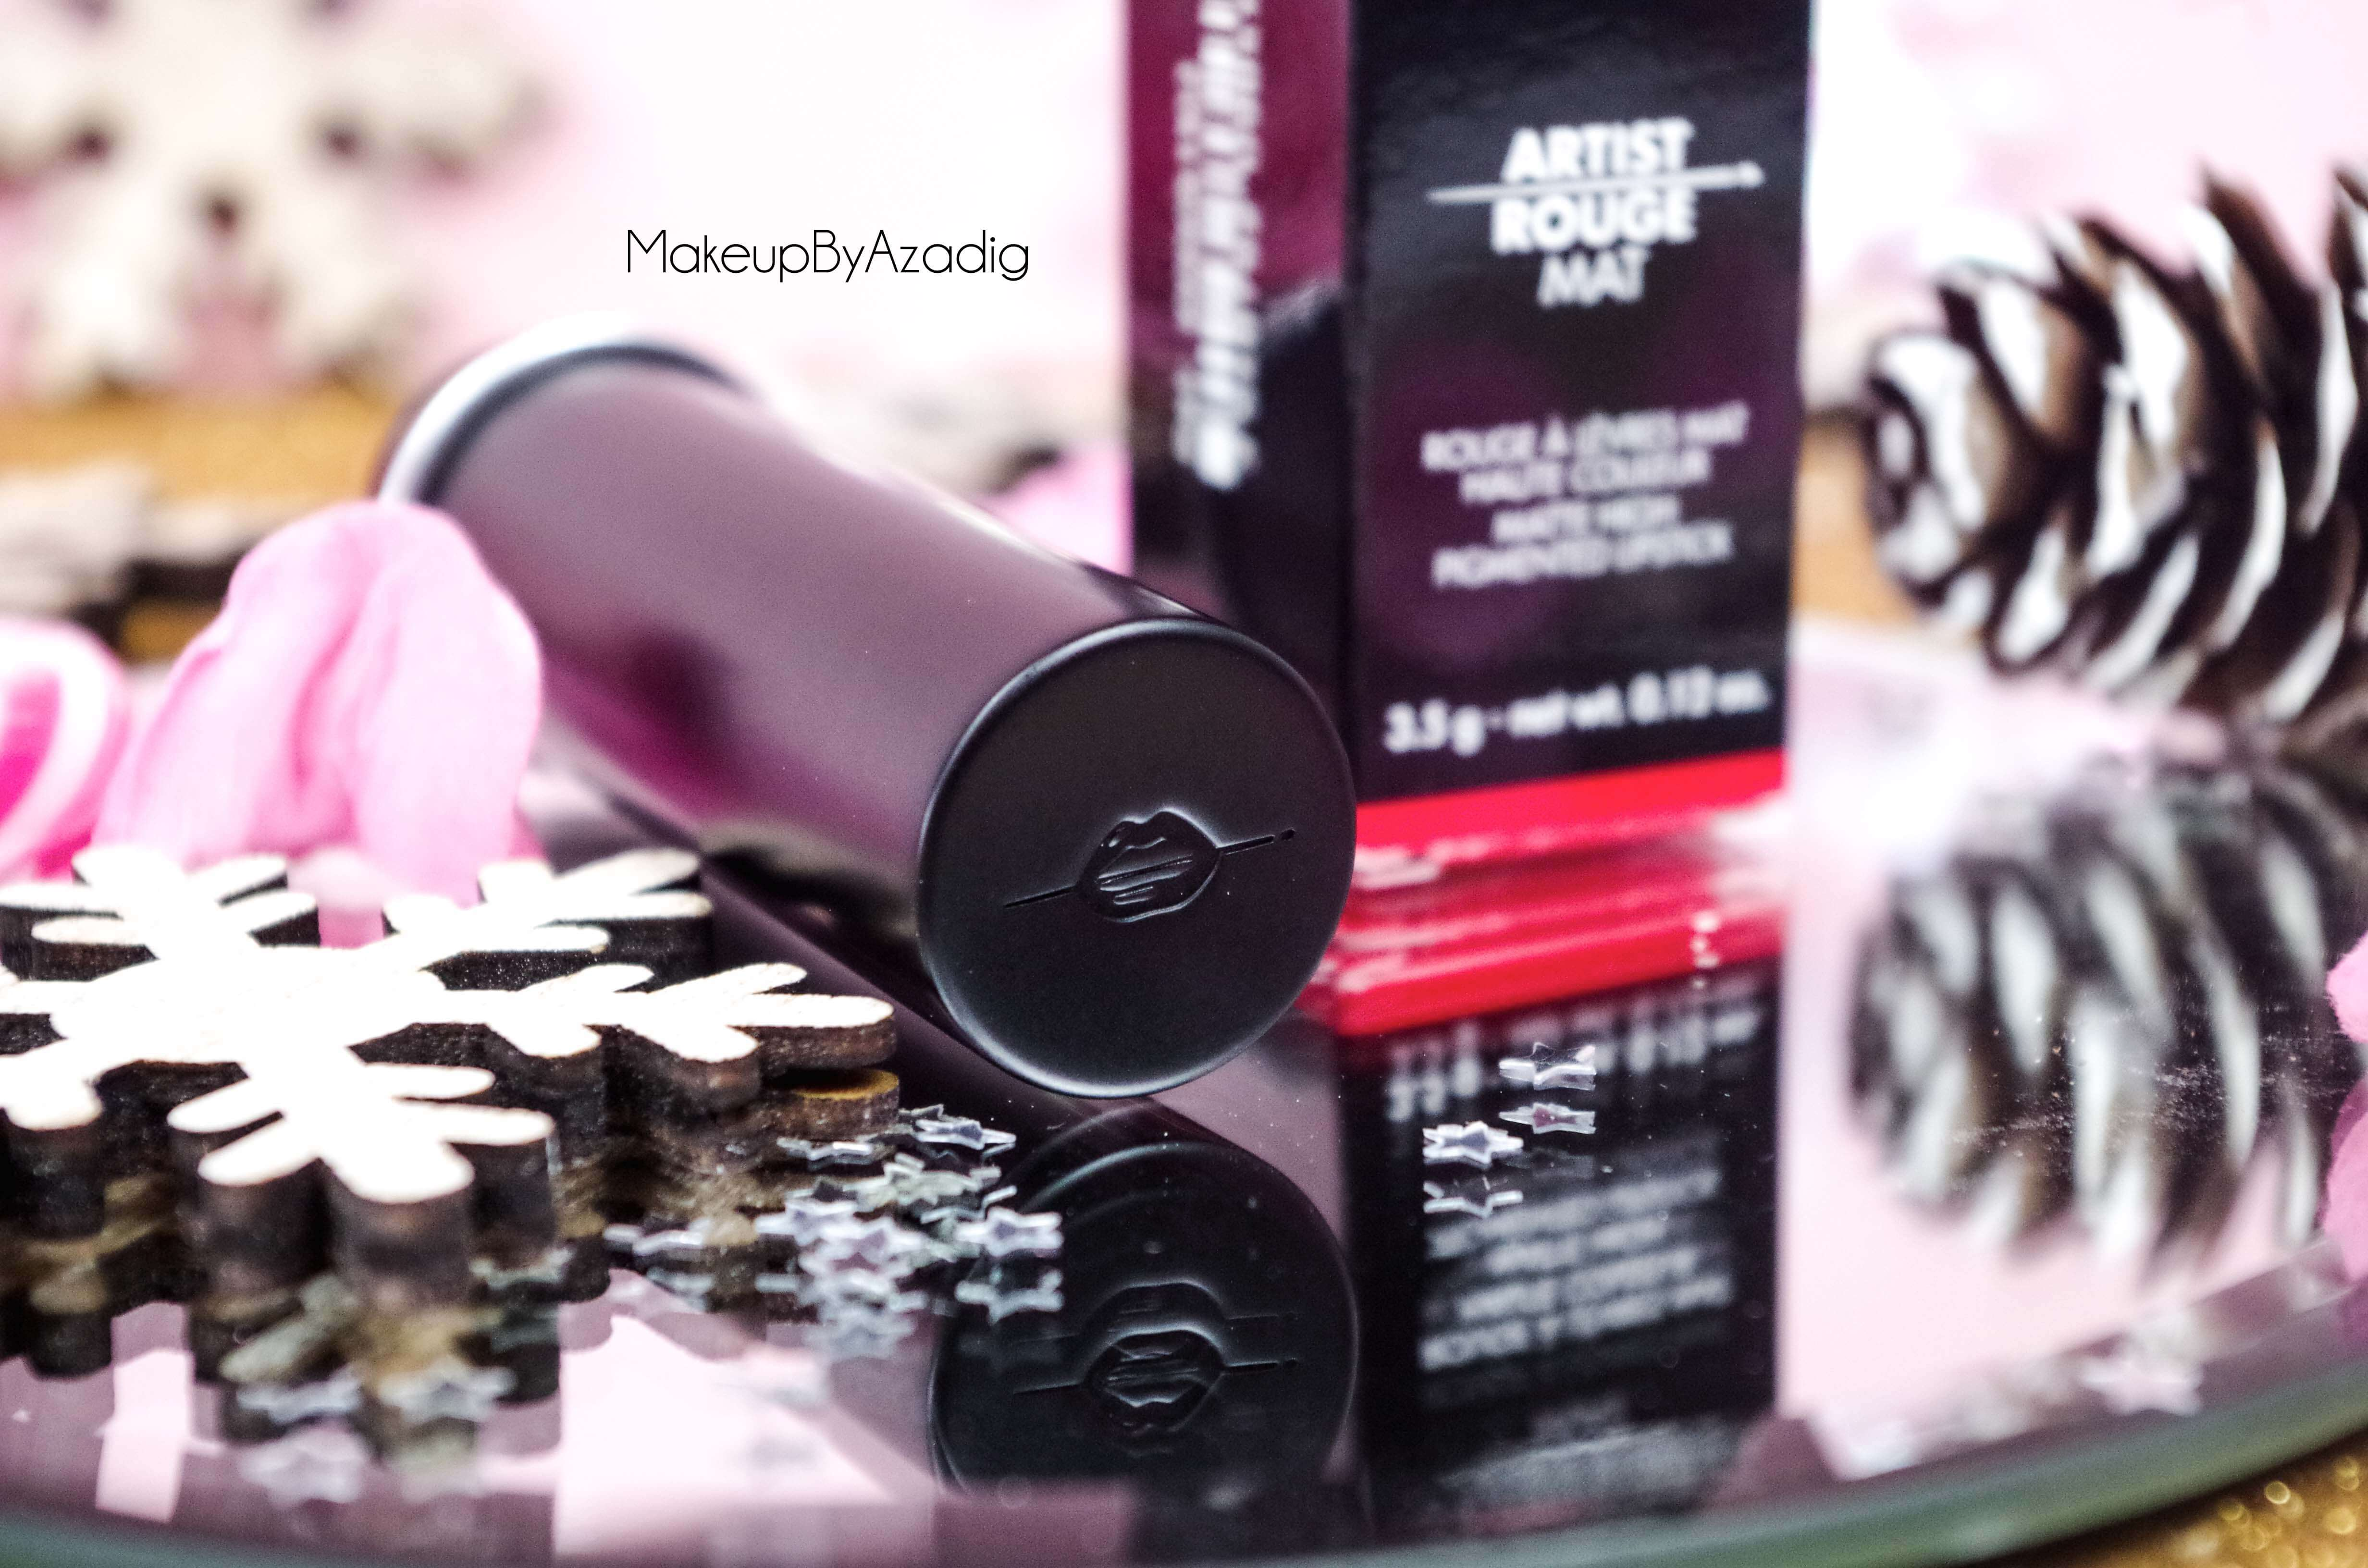 revue-artist-rouge-makeup-for-ever-rouge-levres-mat-sephora-prix-avis-review-m102-makeupbyazadig-lipstick